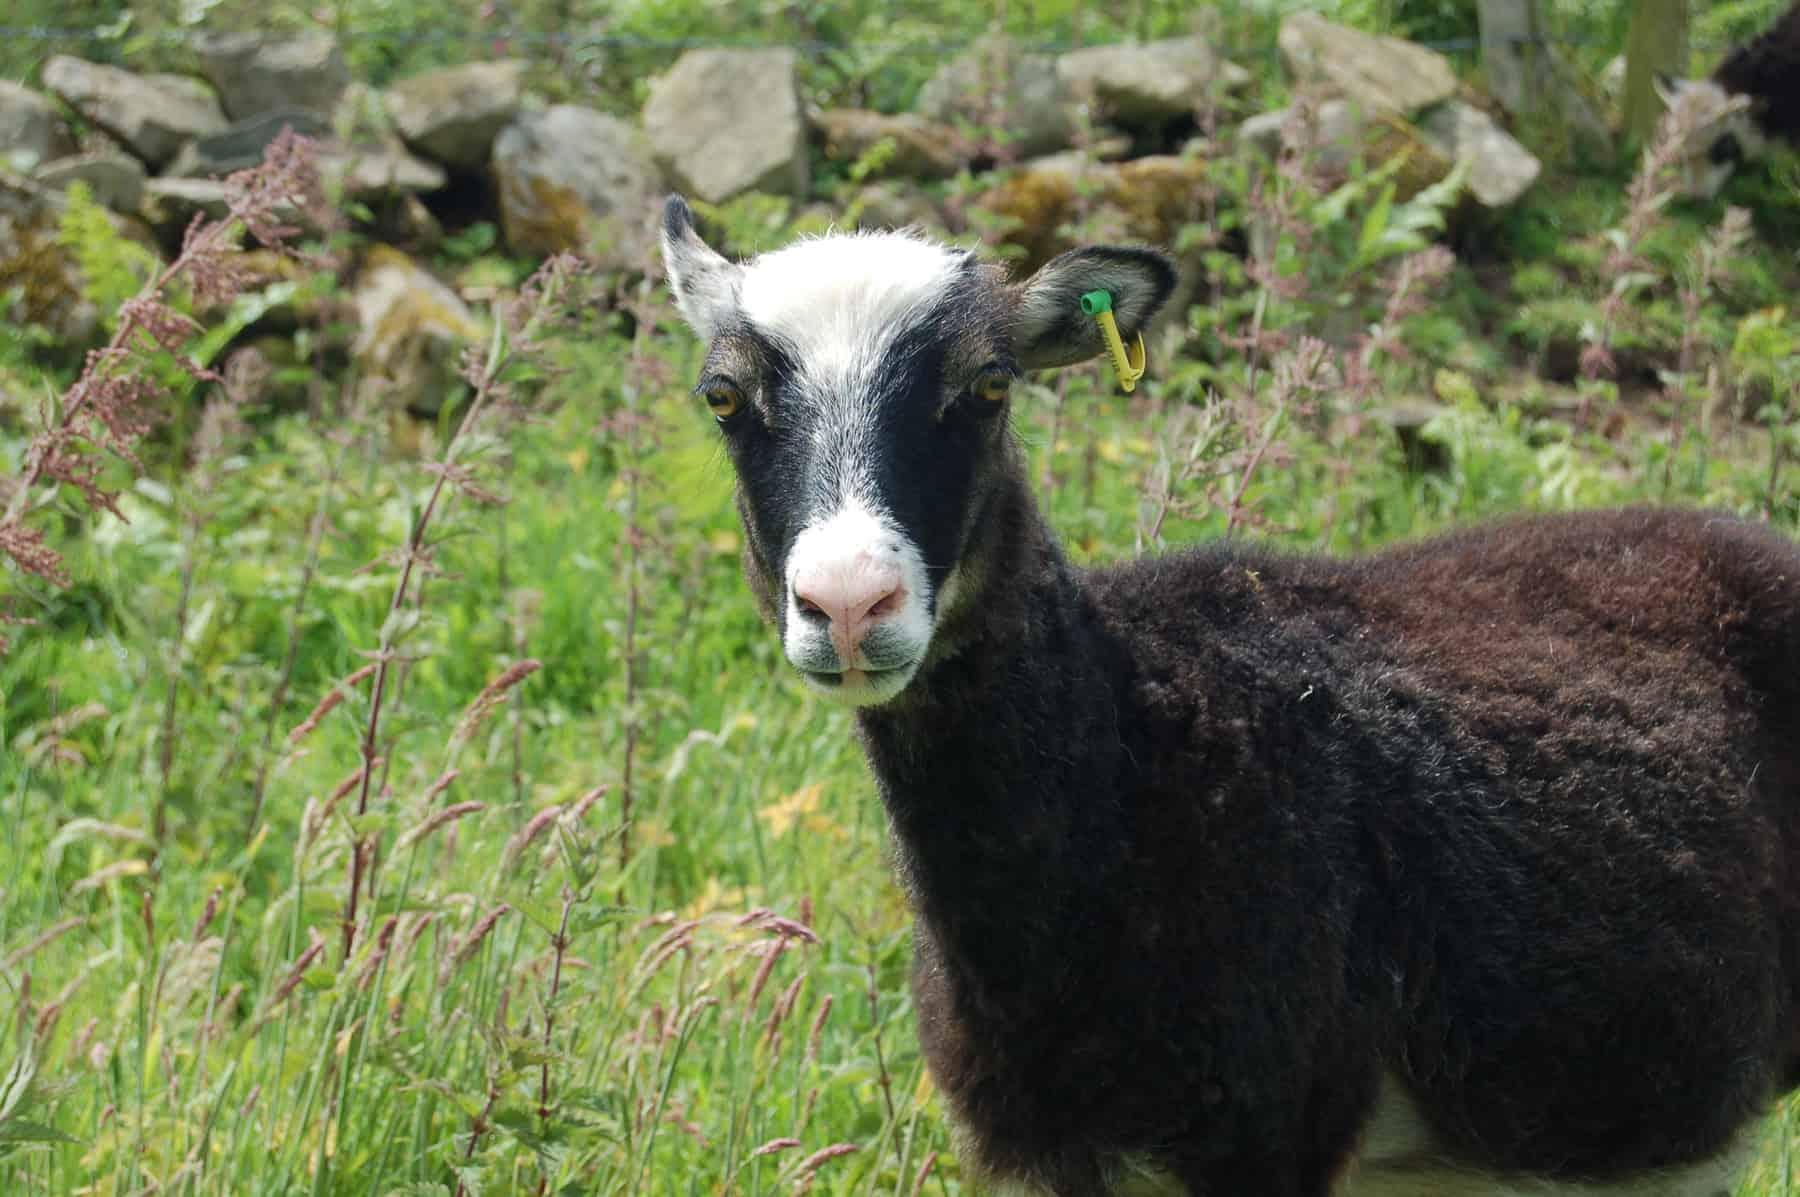 Taragon welsh mountain cross soay sheep wild beautiful wool frosted mouflon 5